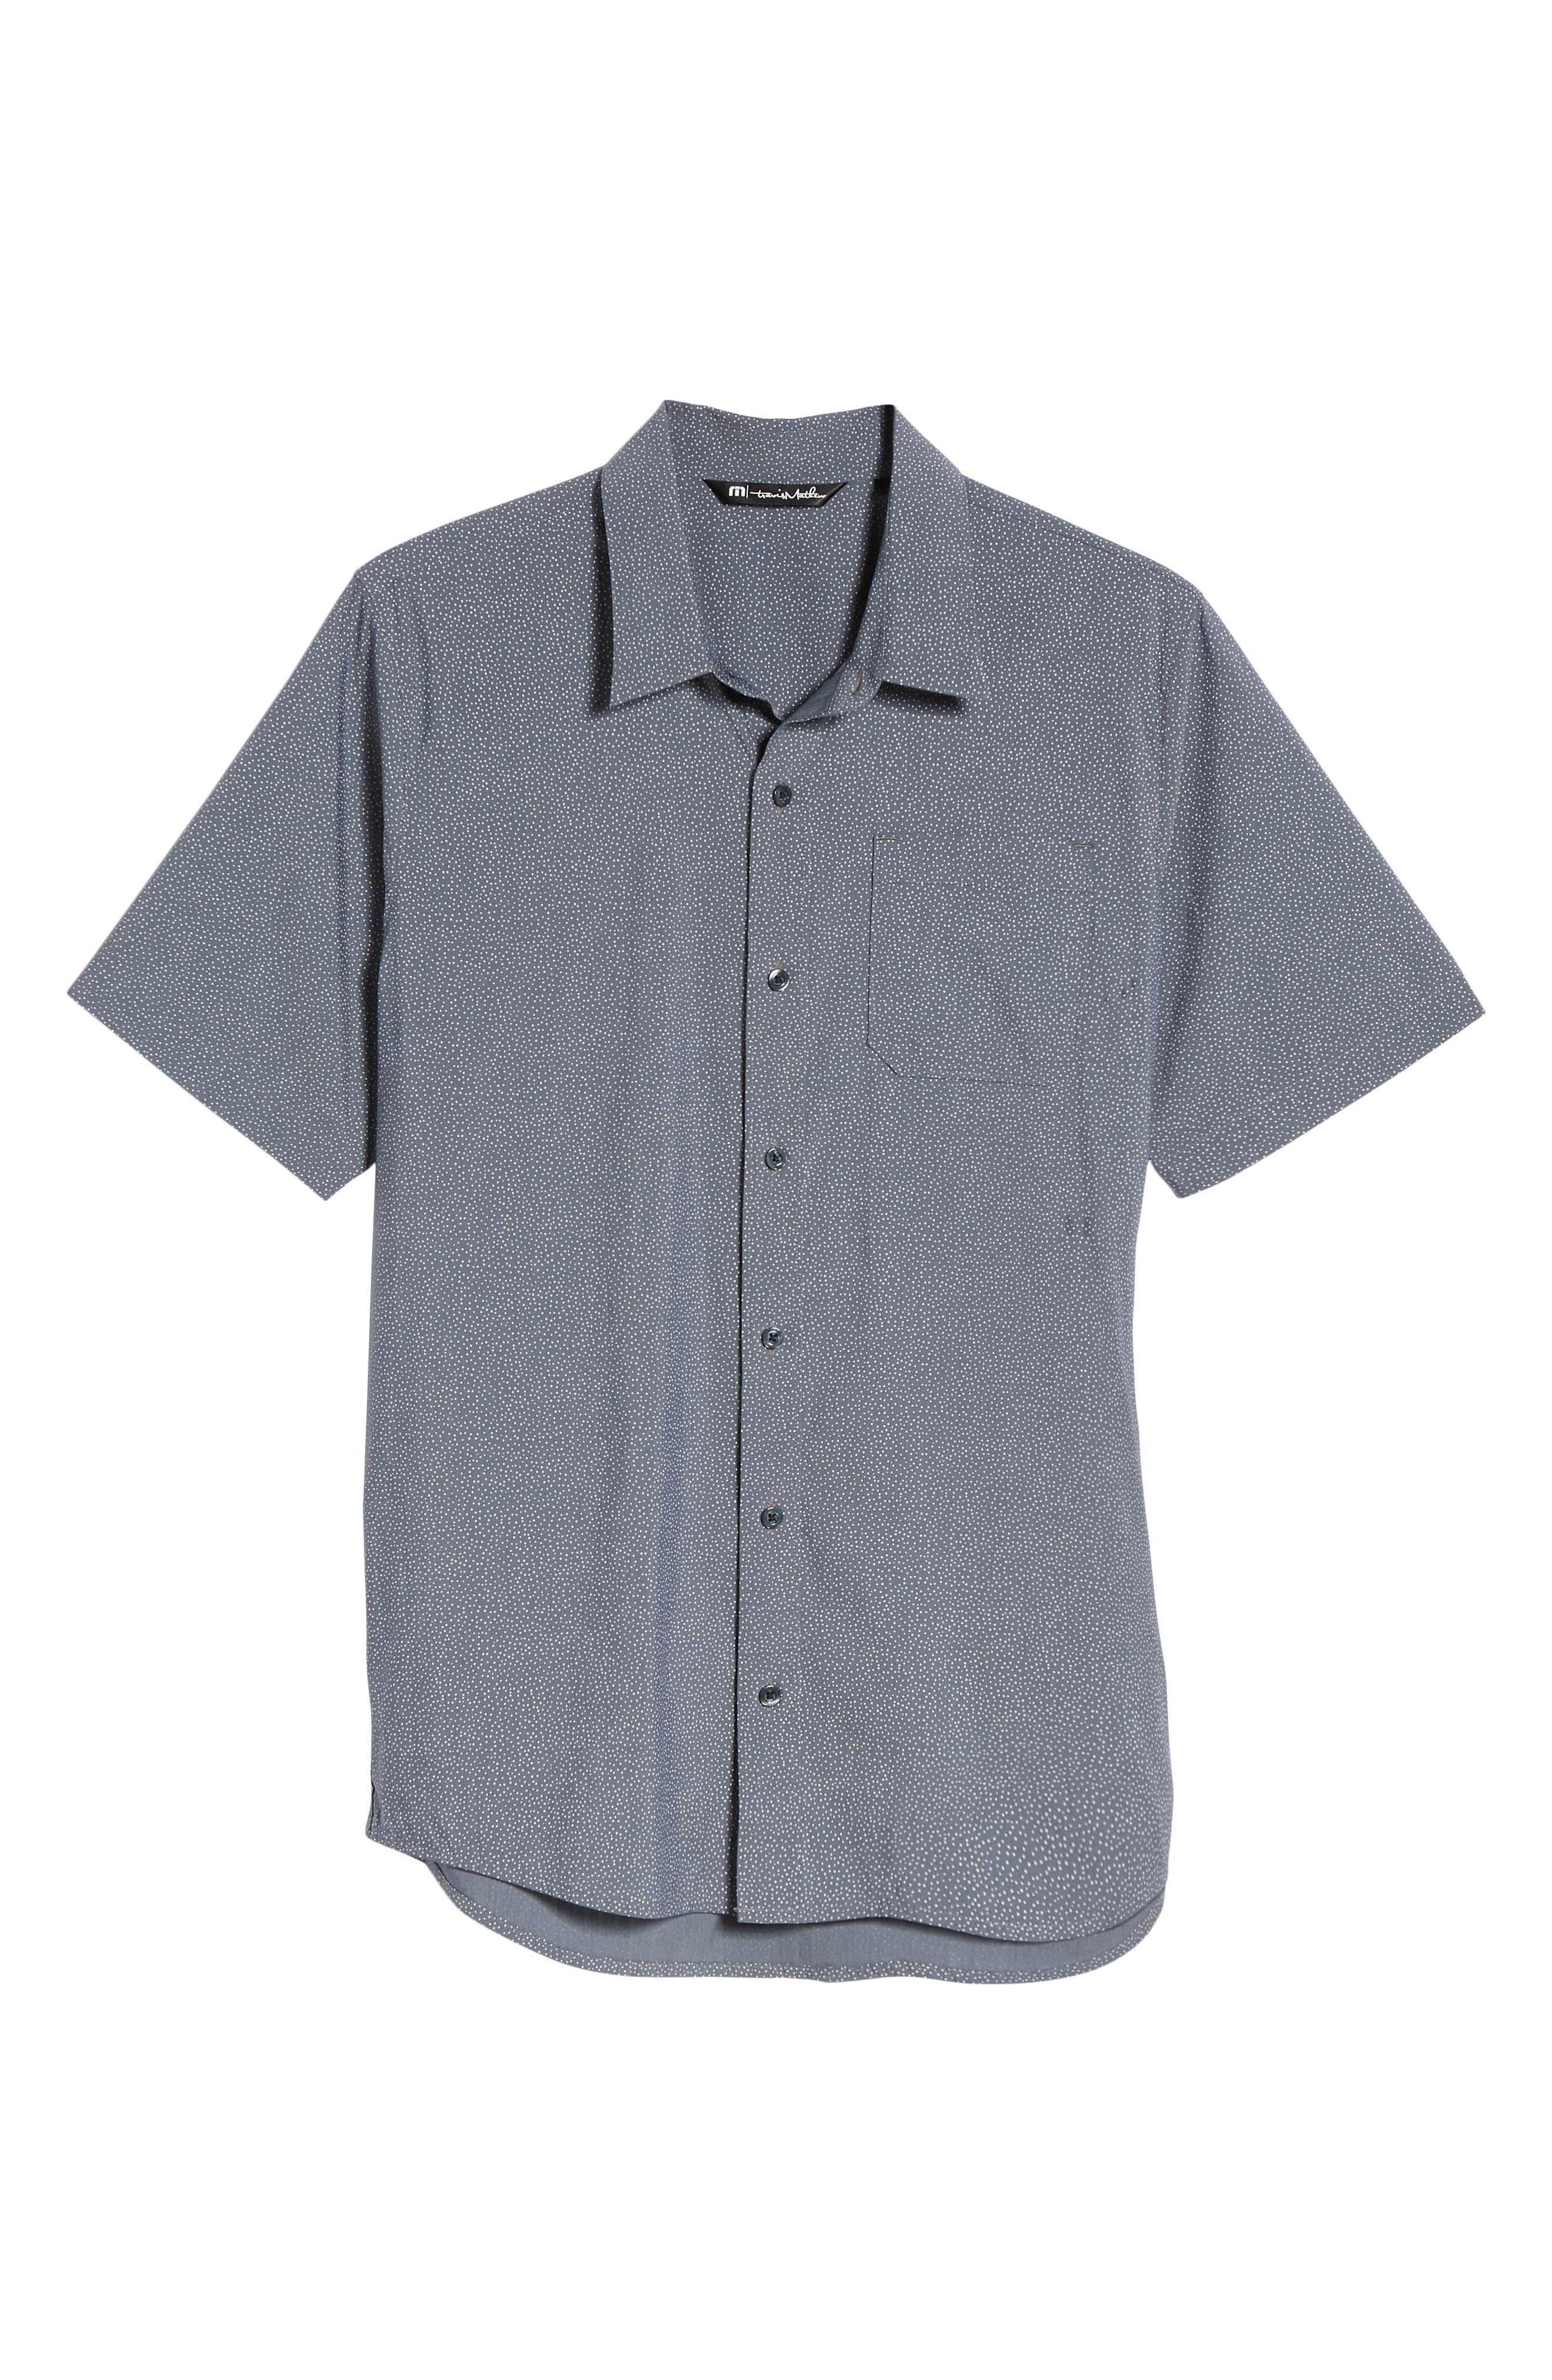 Particles Spot Print Sport Shirt,                             Alternate thumbnail 6, color,                             Blue Nights